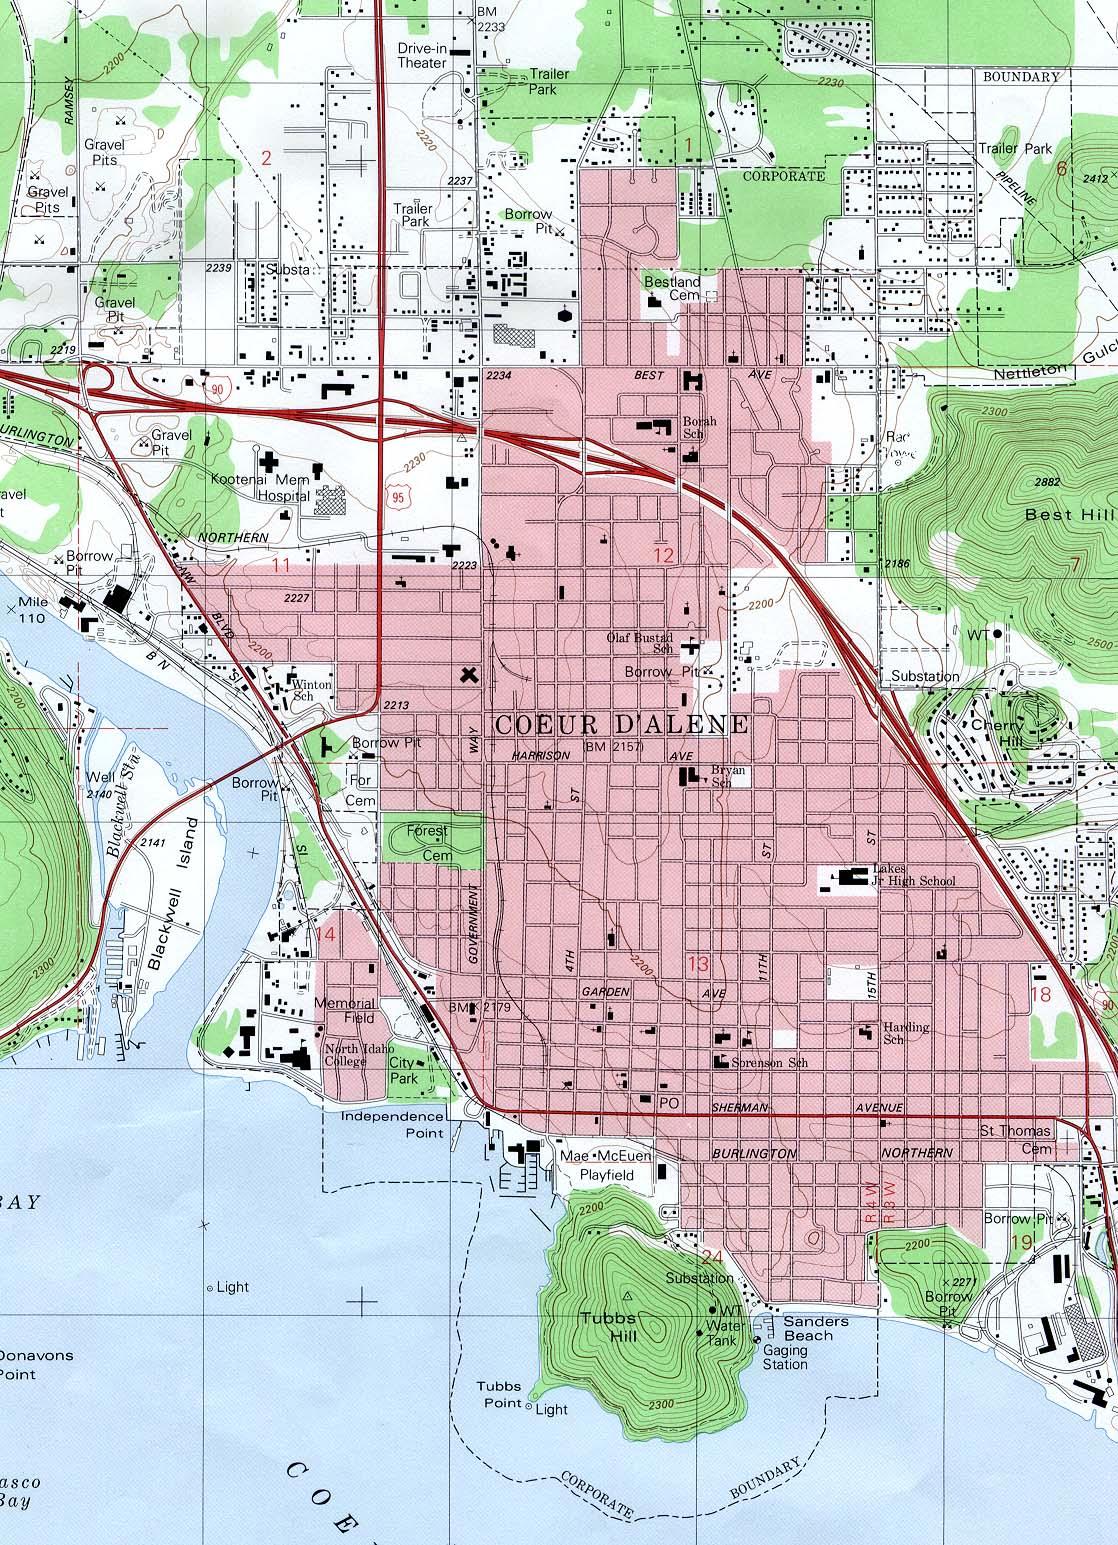 Coeur D'Alene Topographic City Map, Idaho, United States